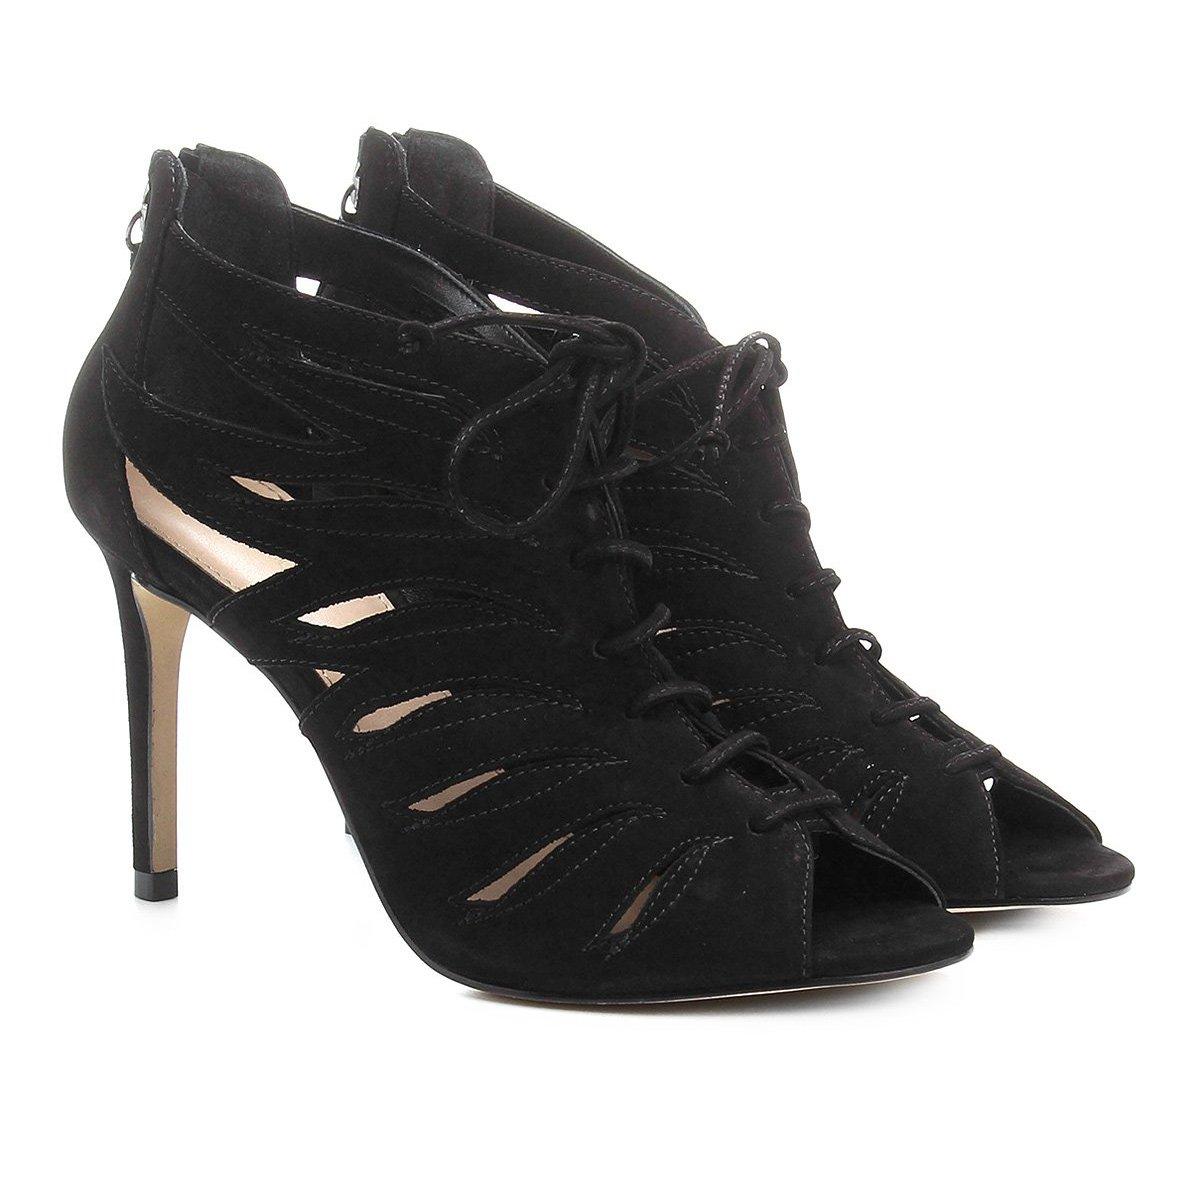 ea87706bf Sandália Couro Shoestock Salto Fino Feminina | Shoestock